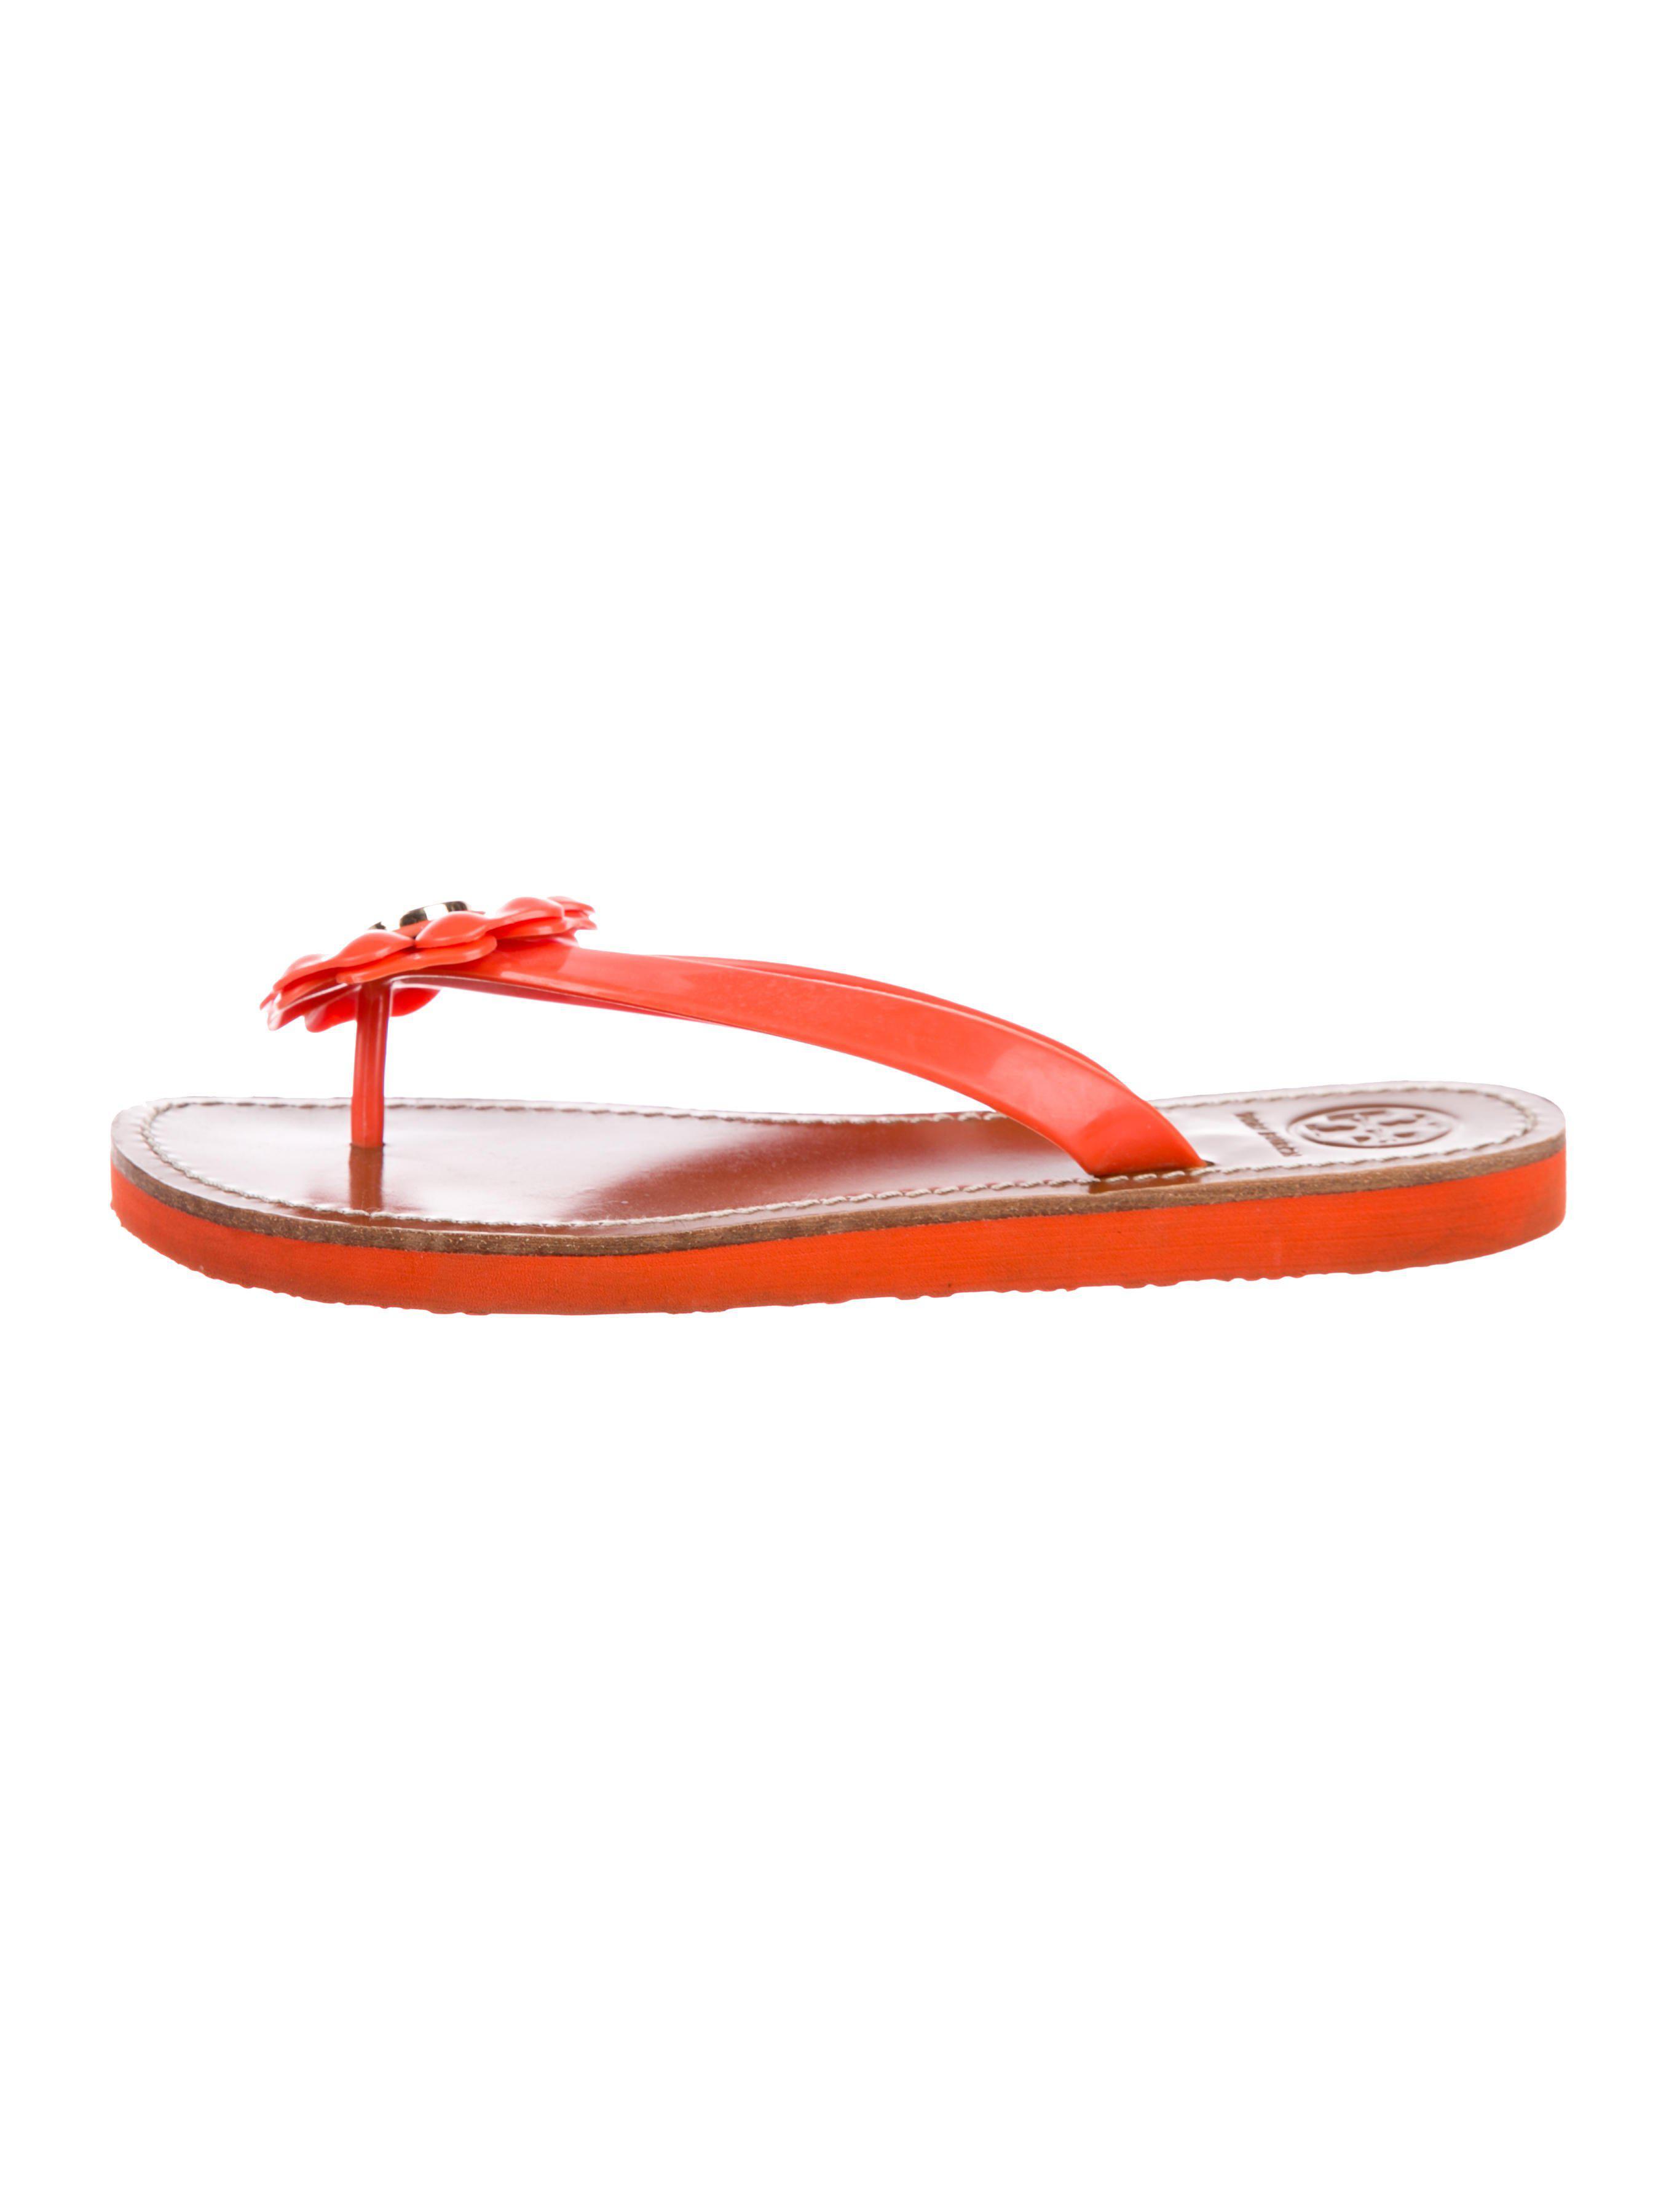 6e80d6ed6fa50 Lyst - Tory Burch Adalia Thong Sandals Orange in Metallic